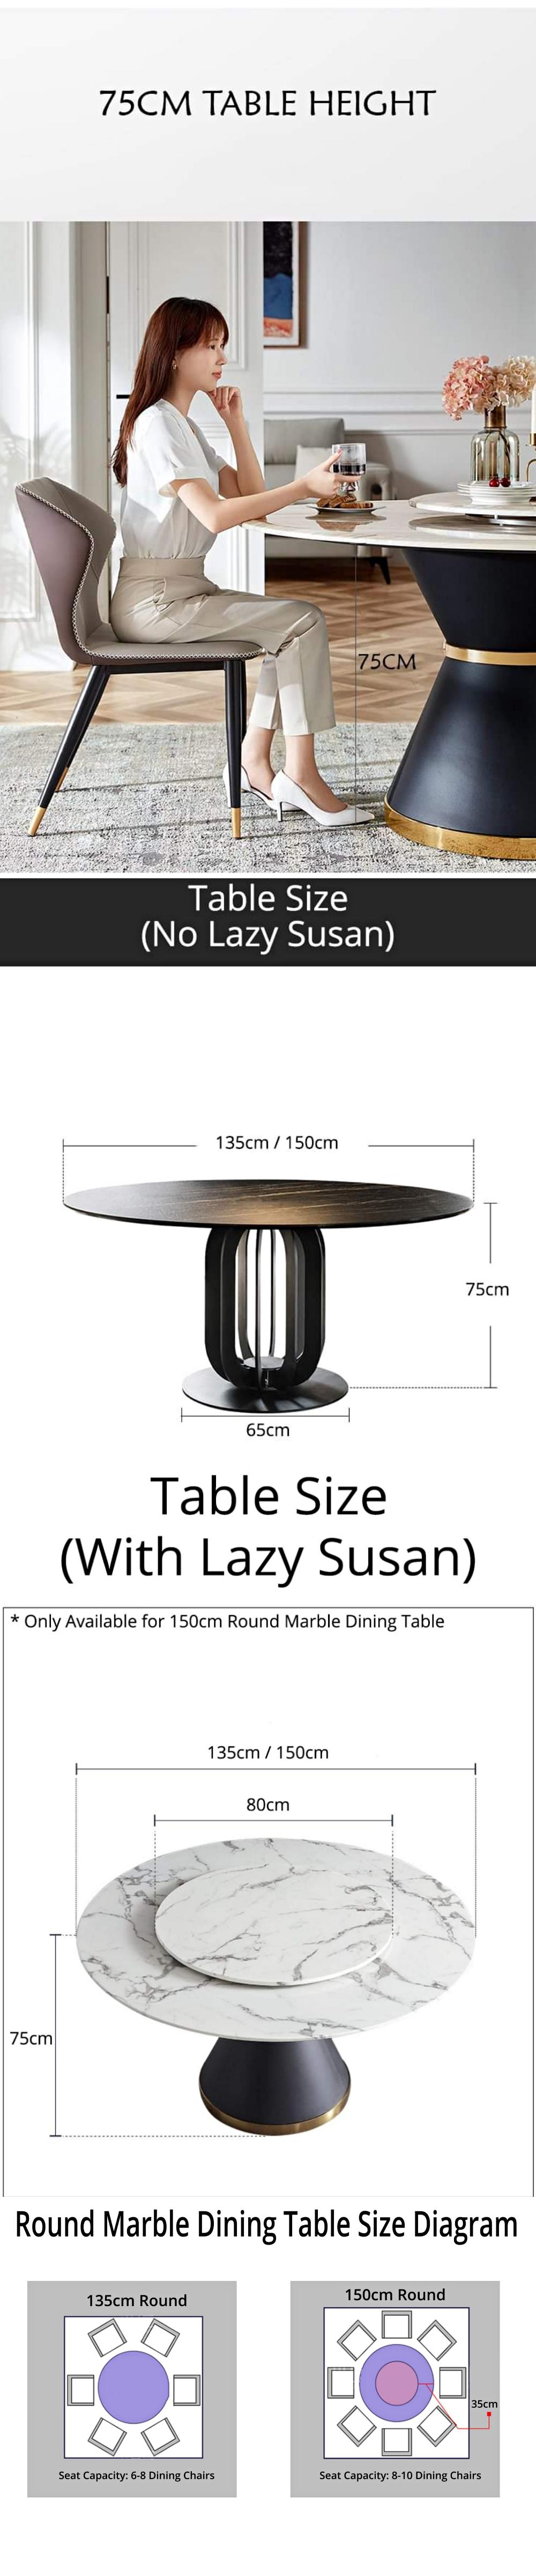 Round-Speaker-Base-Dining-Table-Item-Description-3